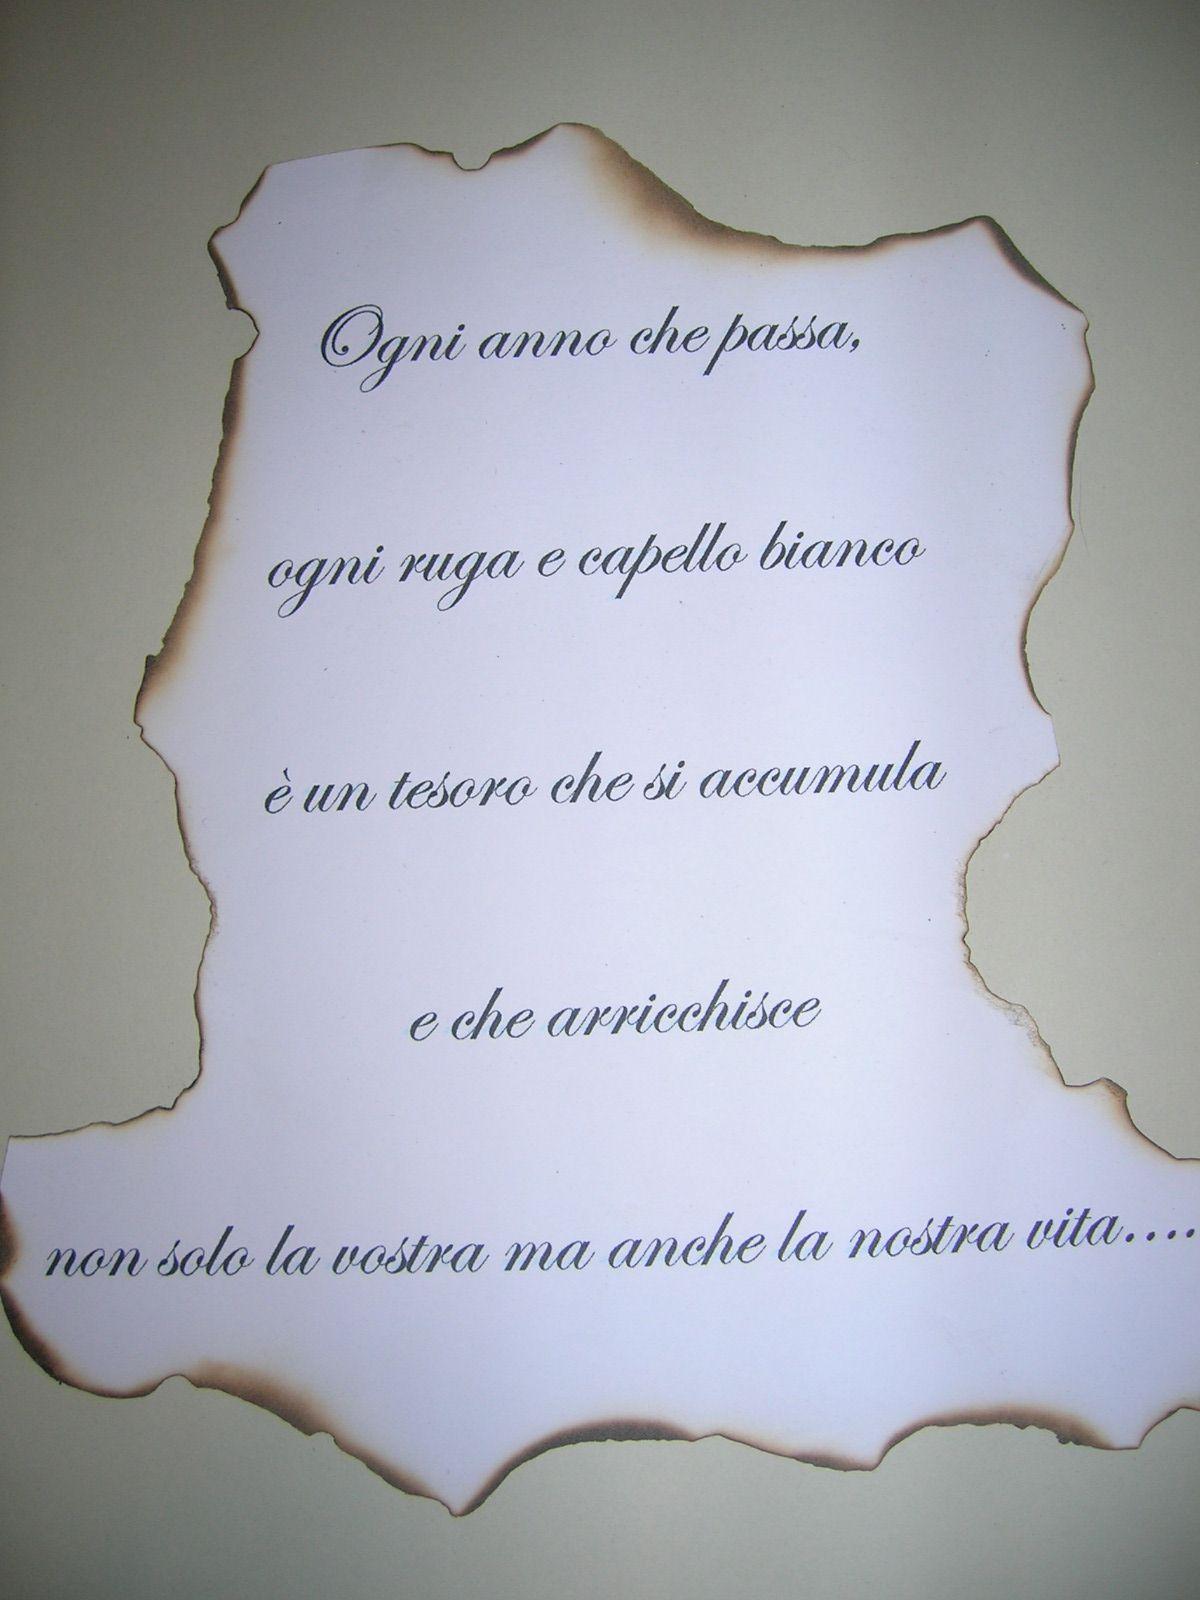 Auguri Felice Matrimonio : Infiniti auguri per un felice matrimonio black sheep grafica